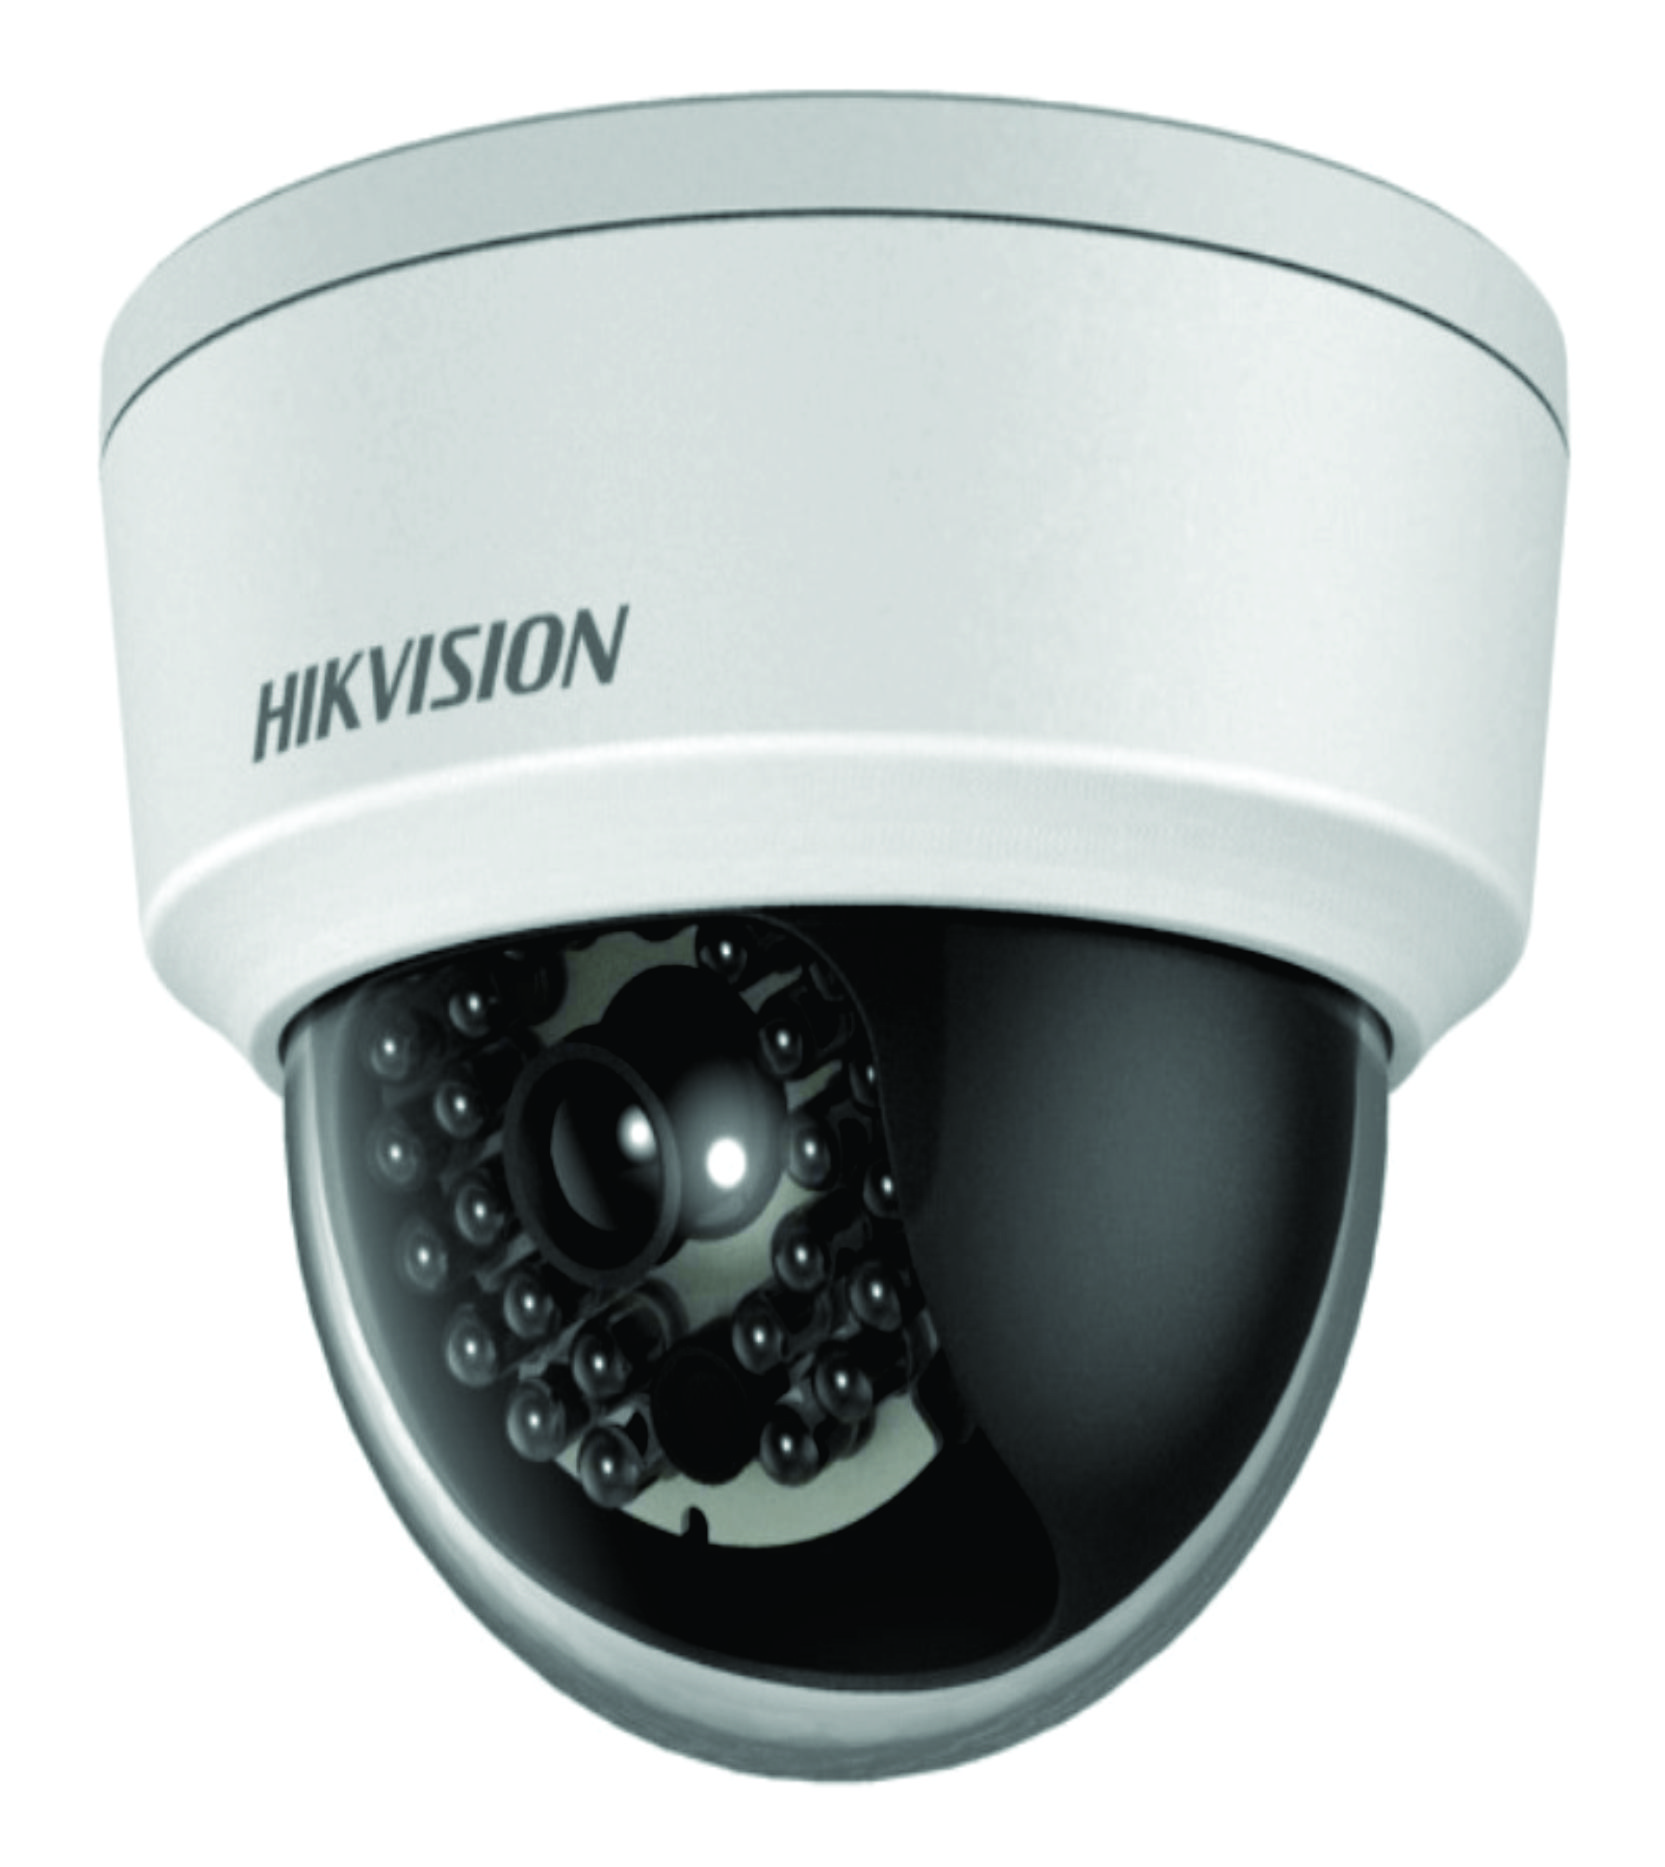 Camera IP Dome hồng ngoại không dây 2.0 Megapixel HIKVISION DS-2CD2120F-IWS